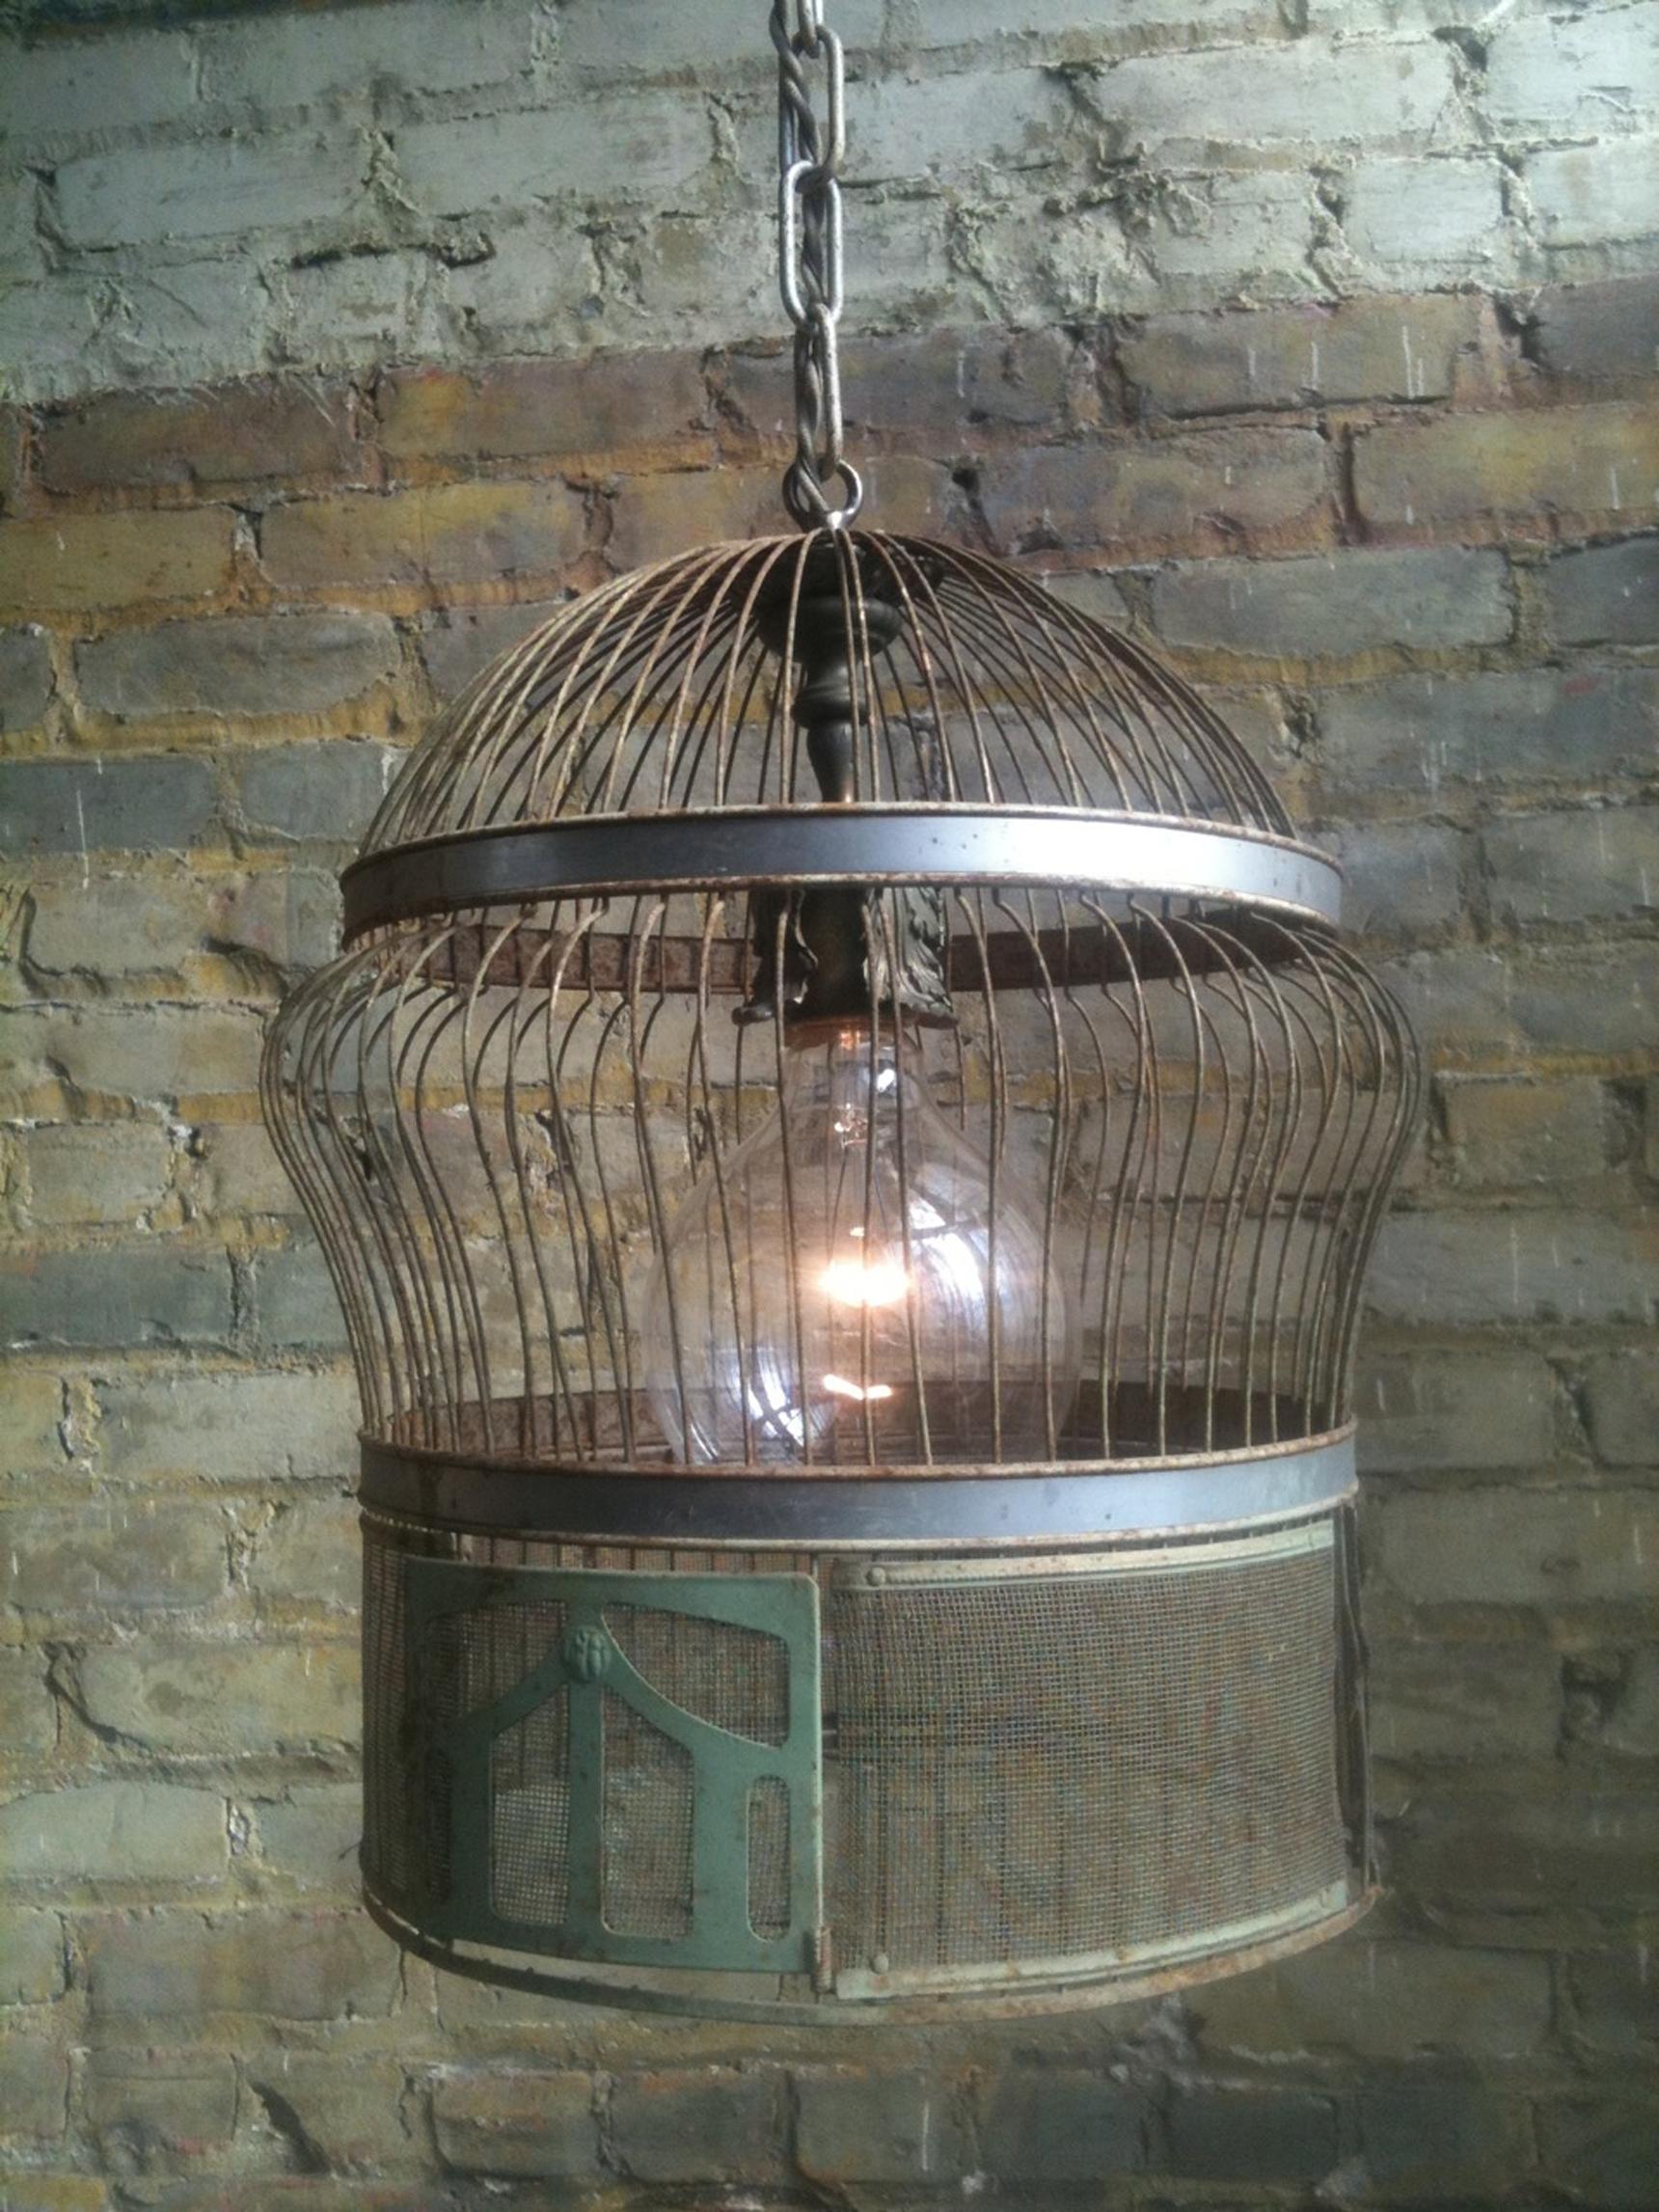 Let 39 s stay cool birdcage lamps vinatge birdcage lanterns - Birdhouse nightlight ...